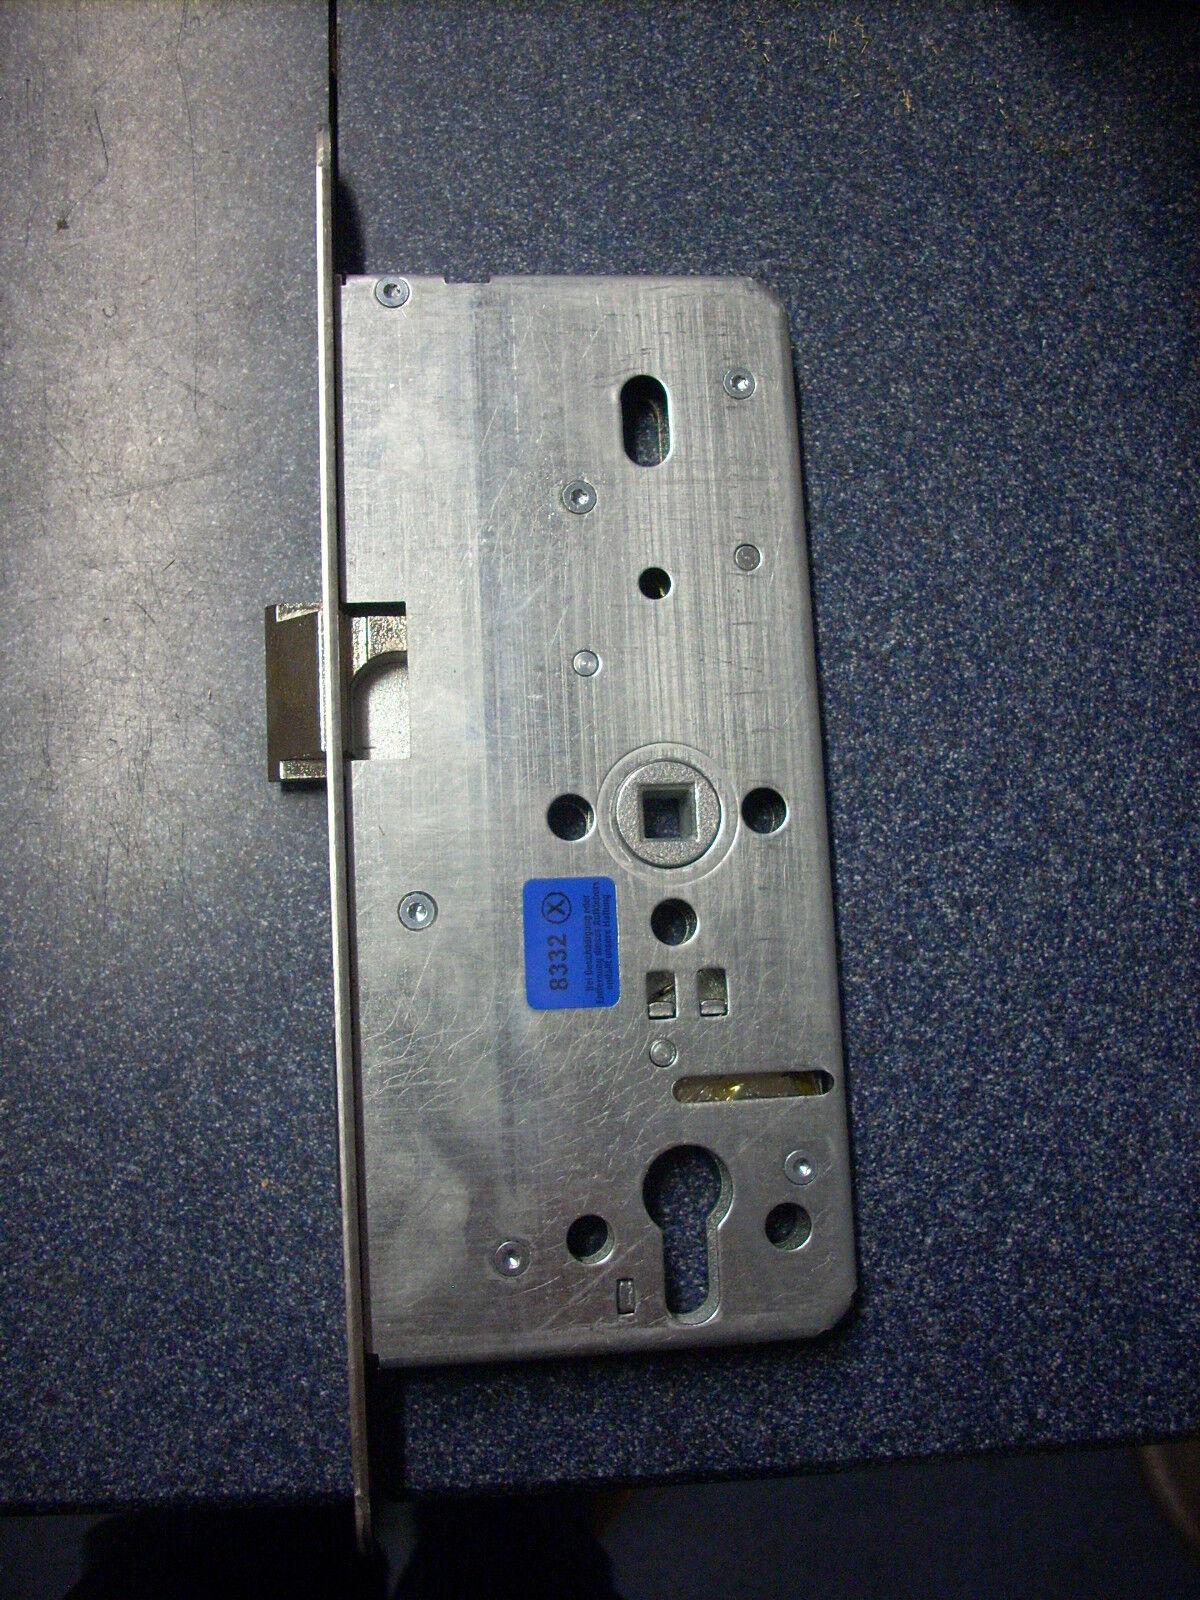 BKS 2338 mit Obenverriegelung 72 / 65  9 mm Nuß Dorn 65 DIN links